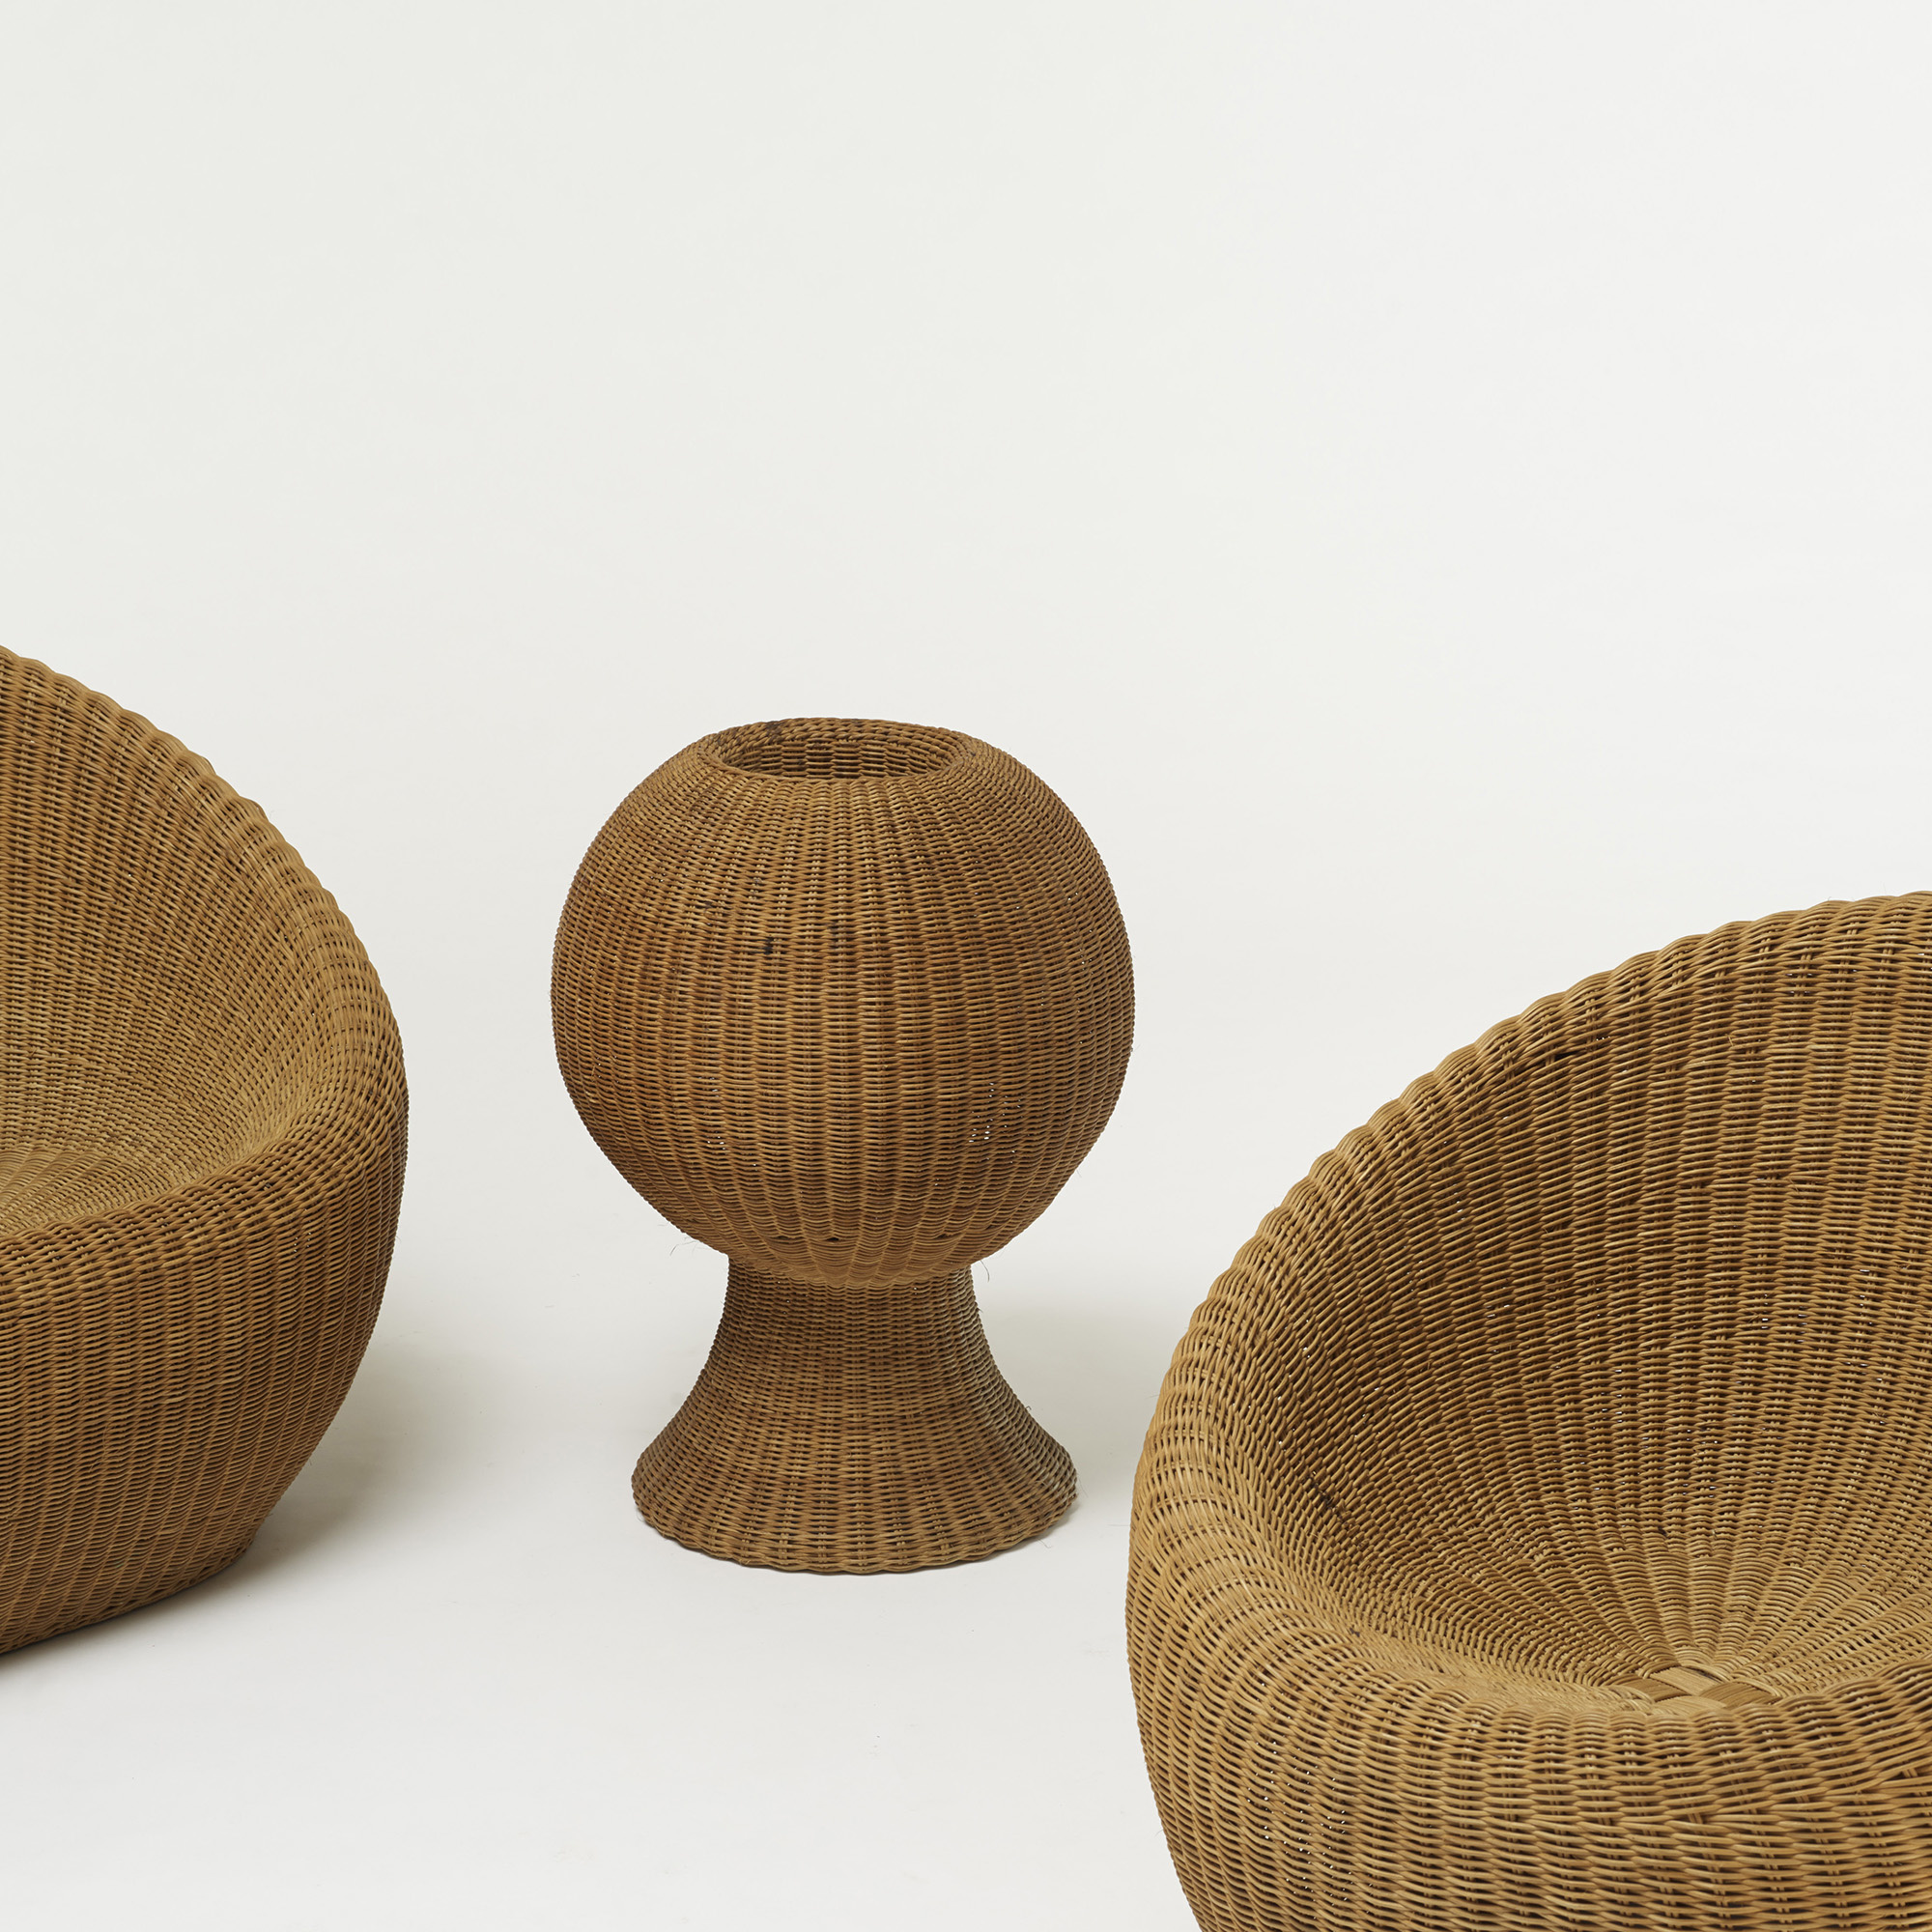 468 Isamu Kenmochi Rattan Furniture Suite Design 17 October